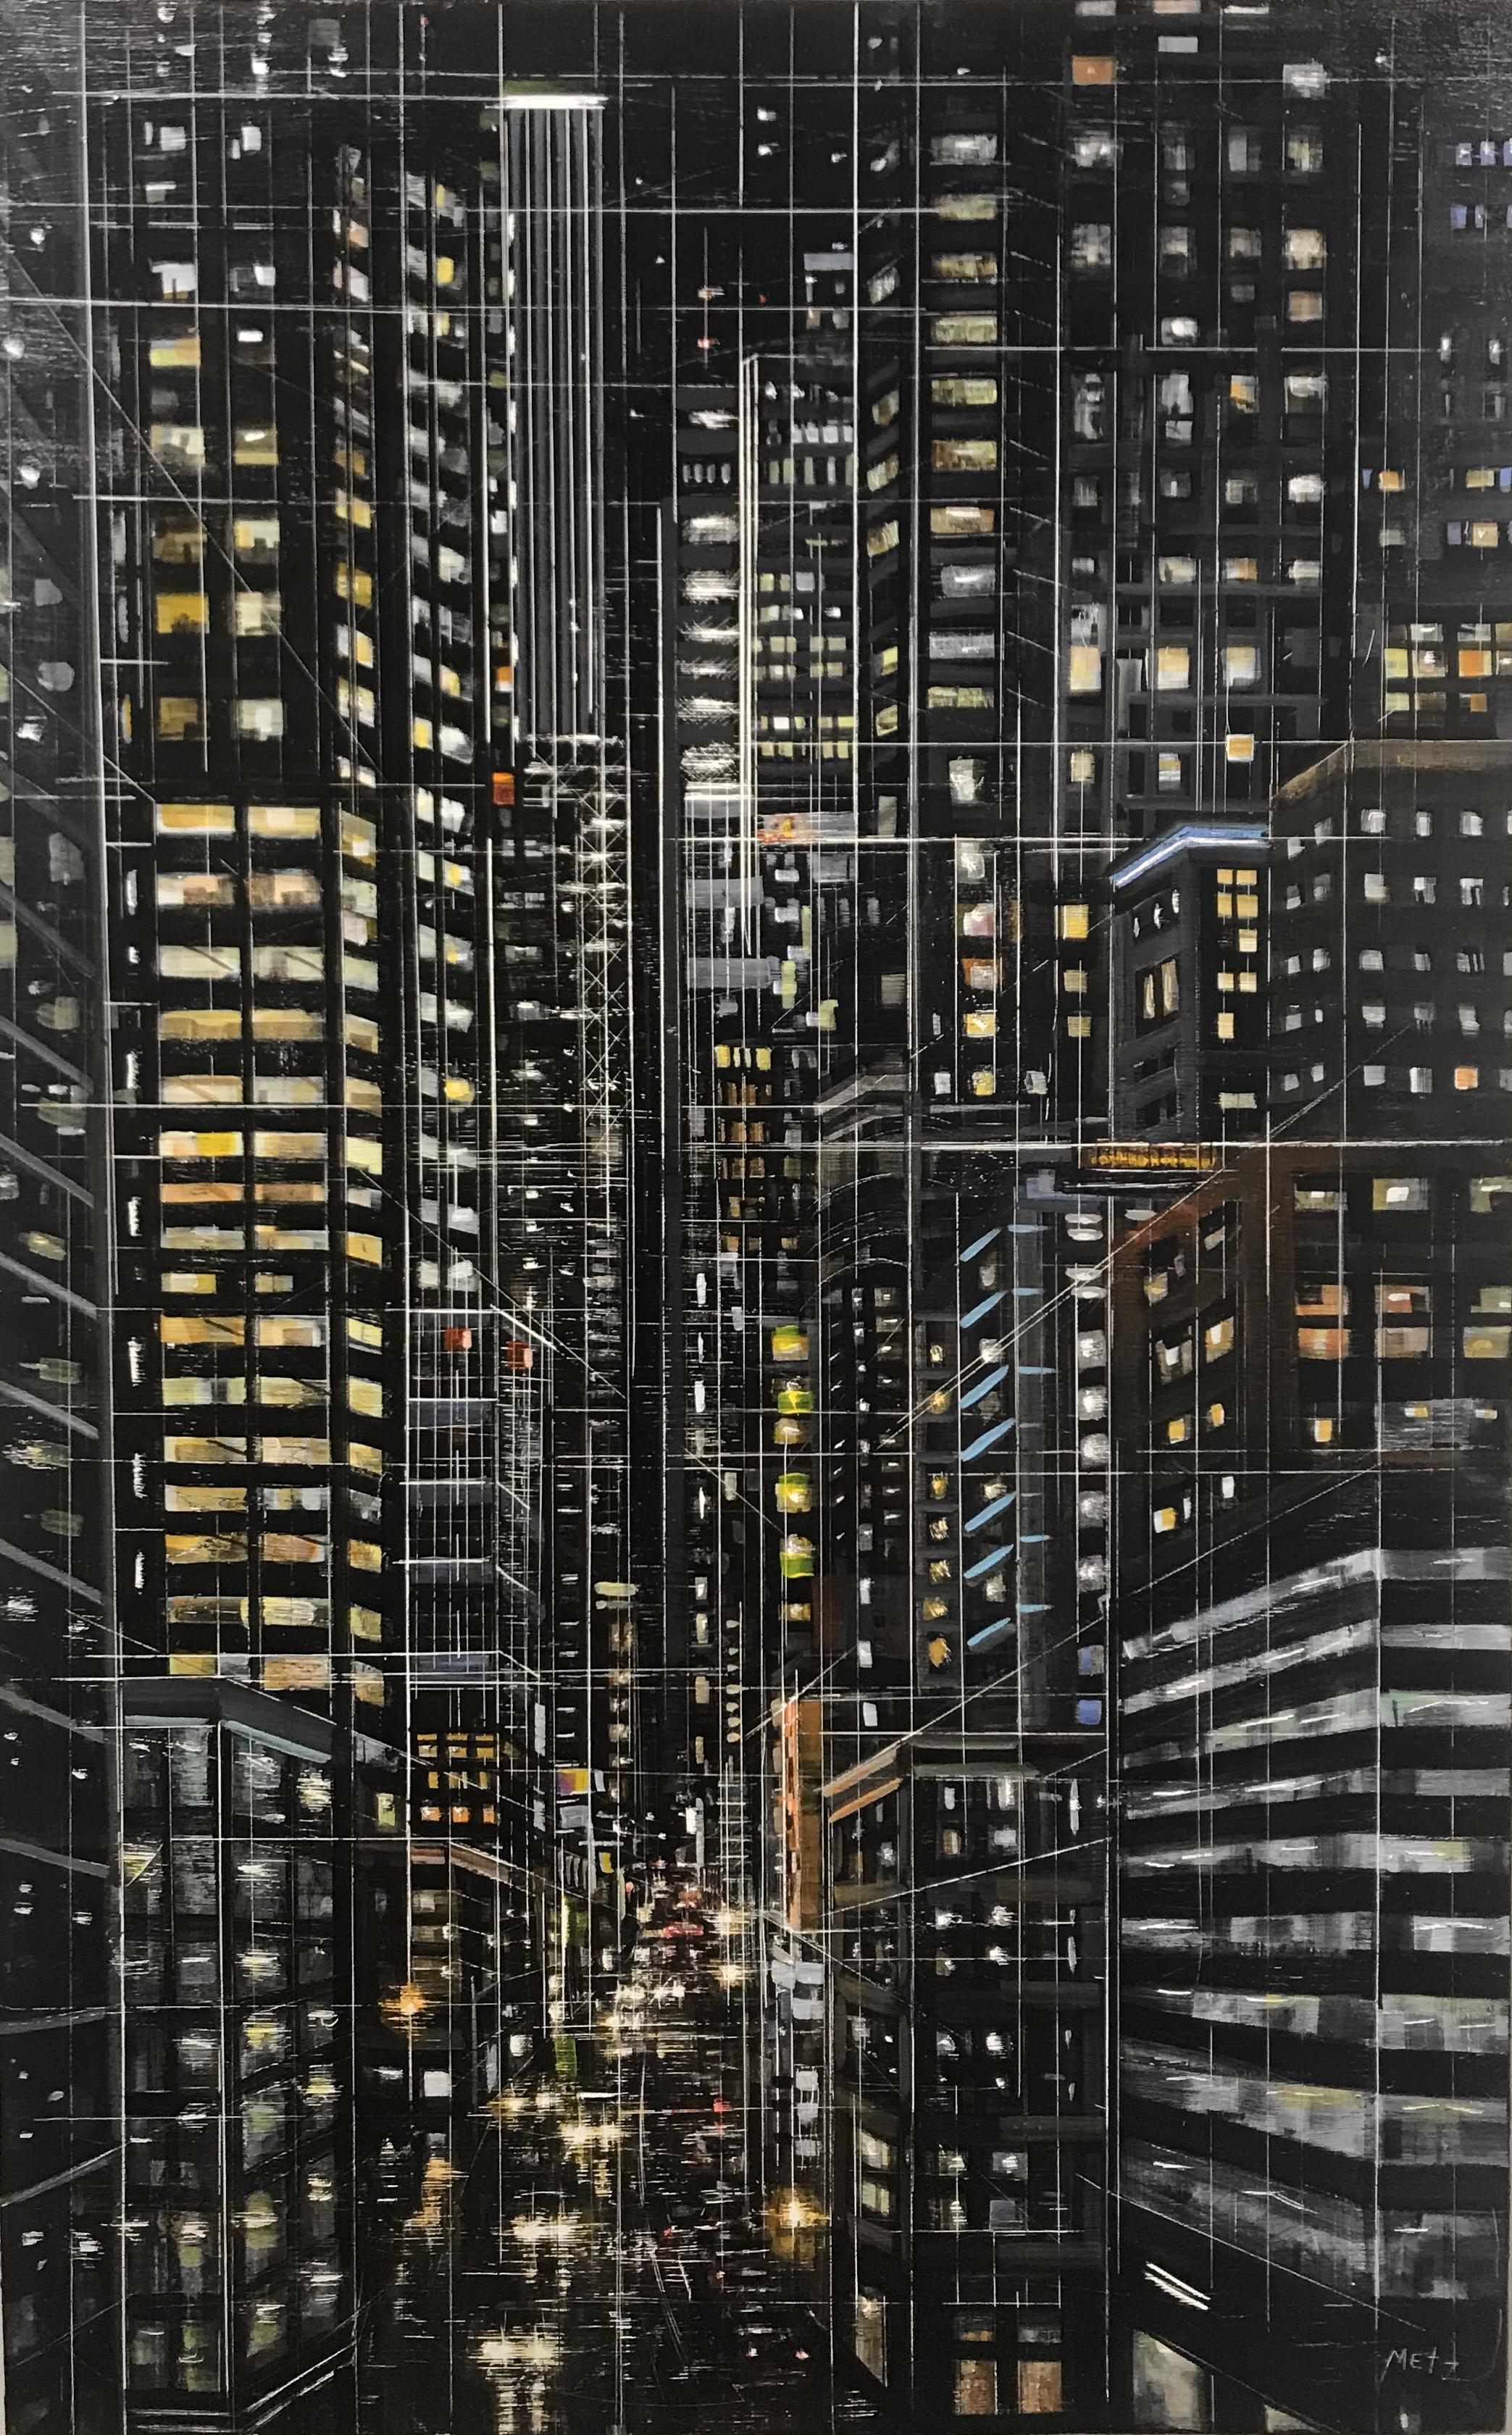 City Darshan 22 46x29in acrylic on panel 2018.JPG